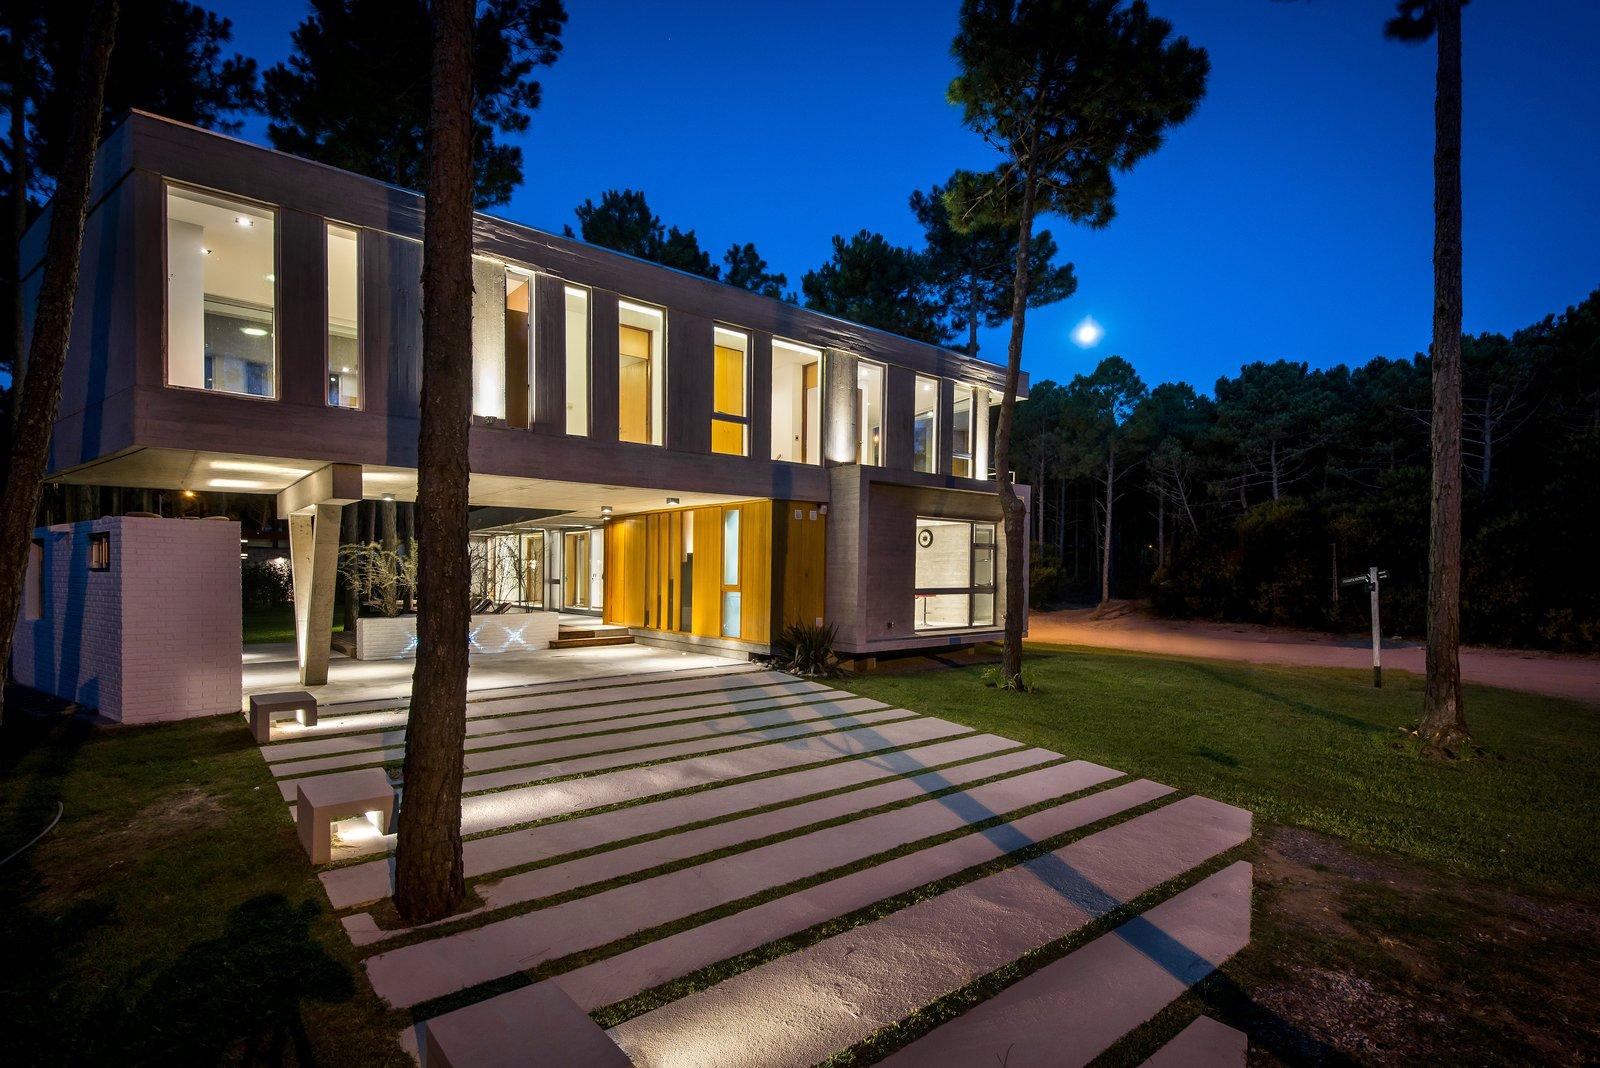 Outdoor, Front Yard, and Trees  Casa Batin by Estudio Galera